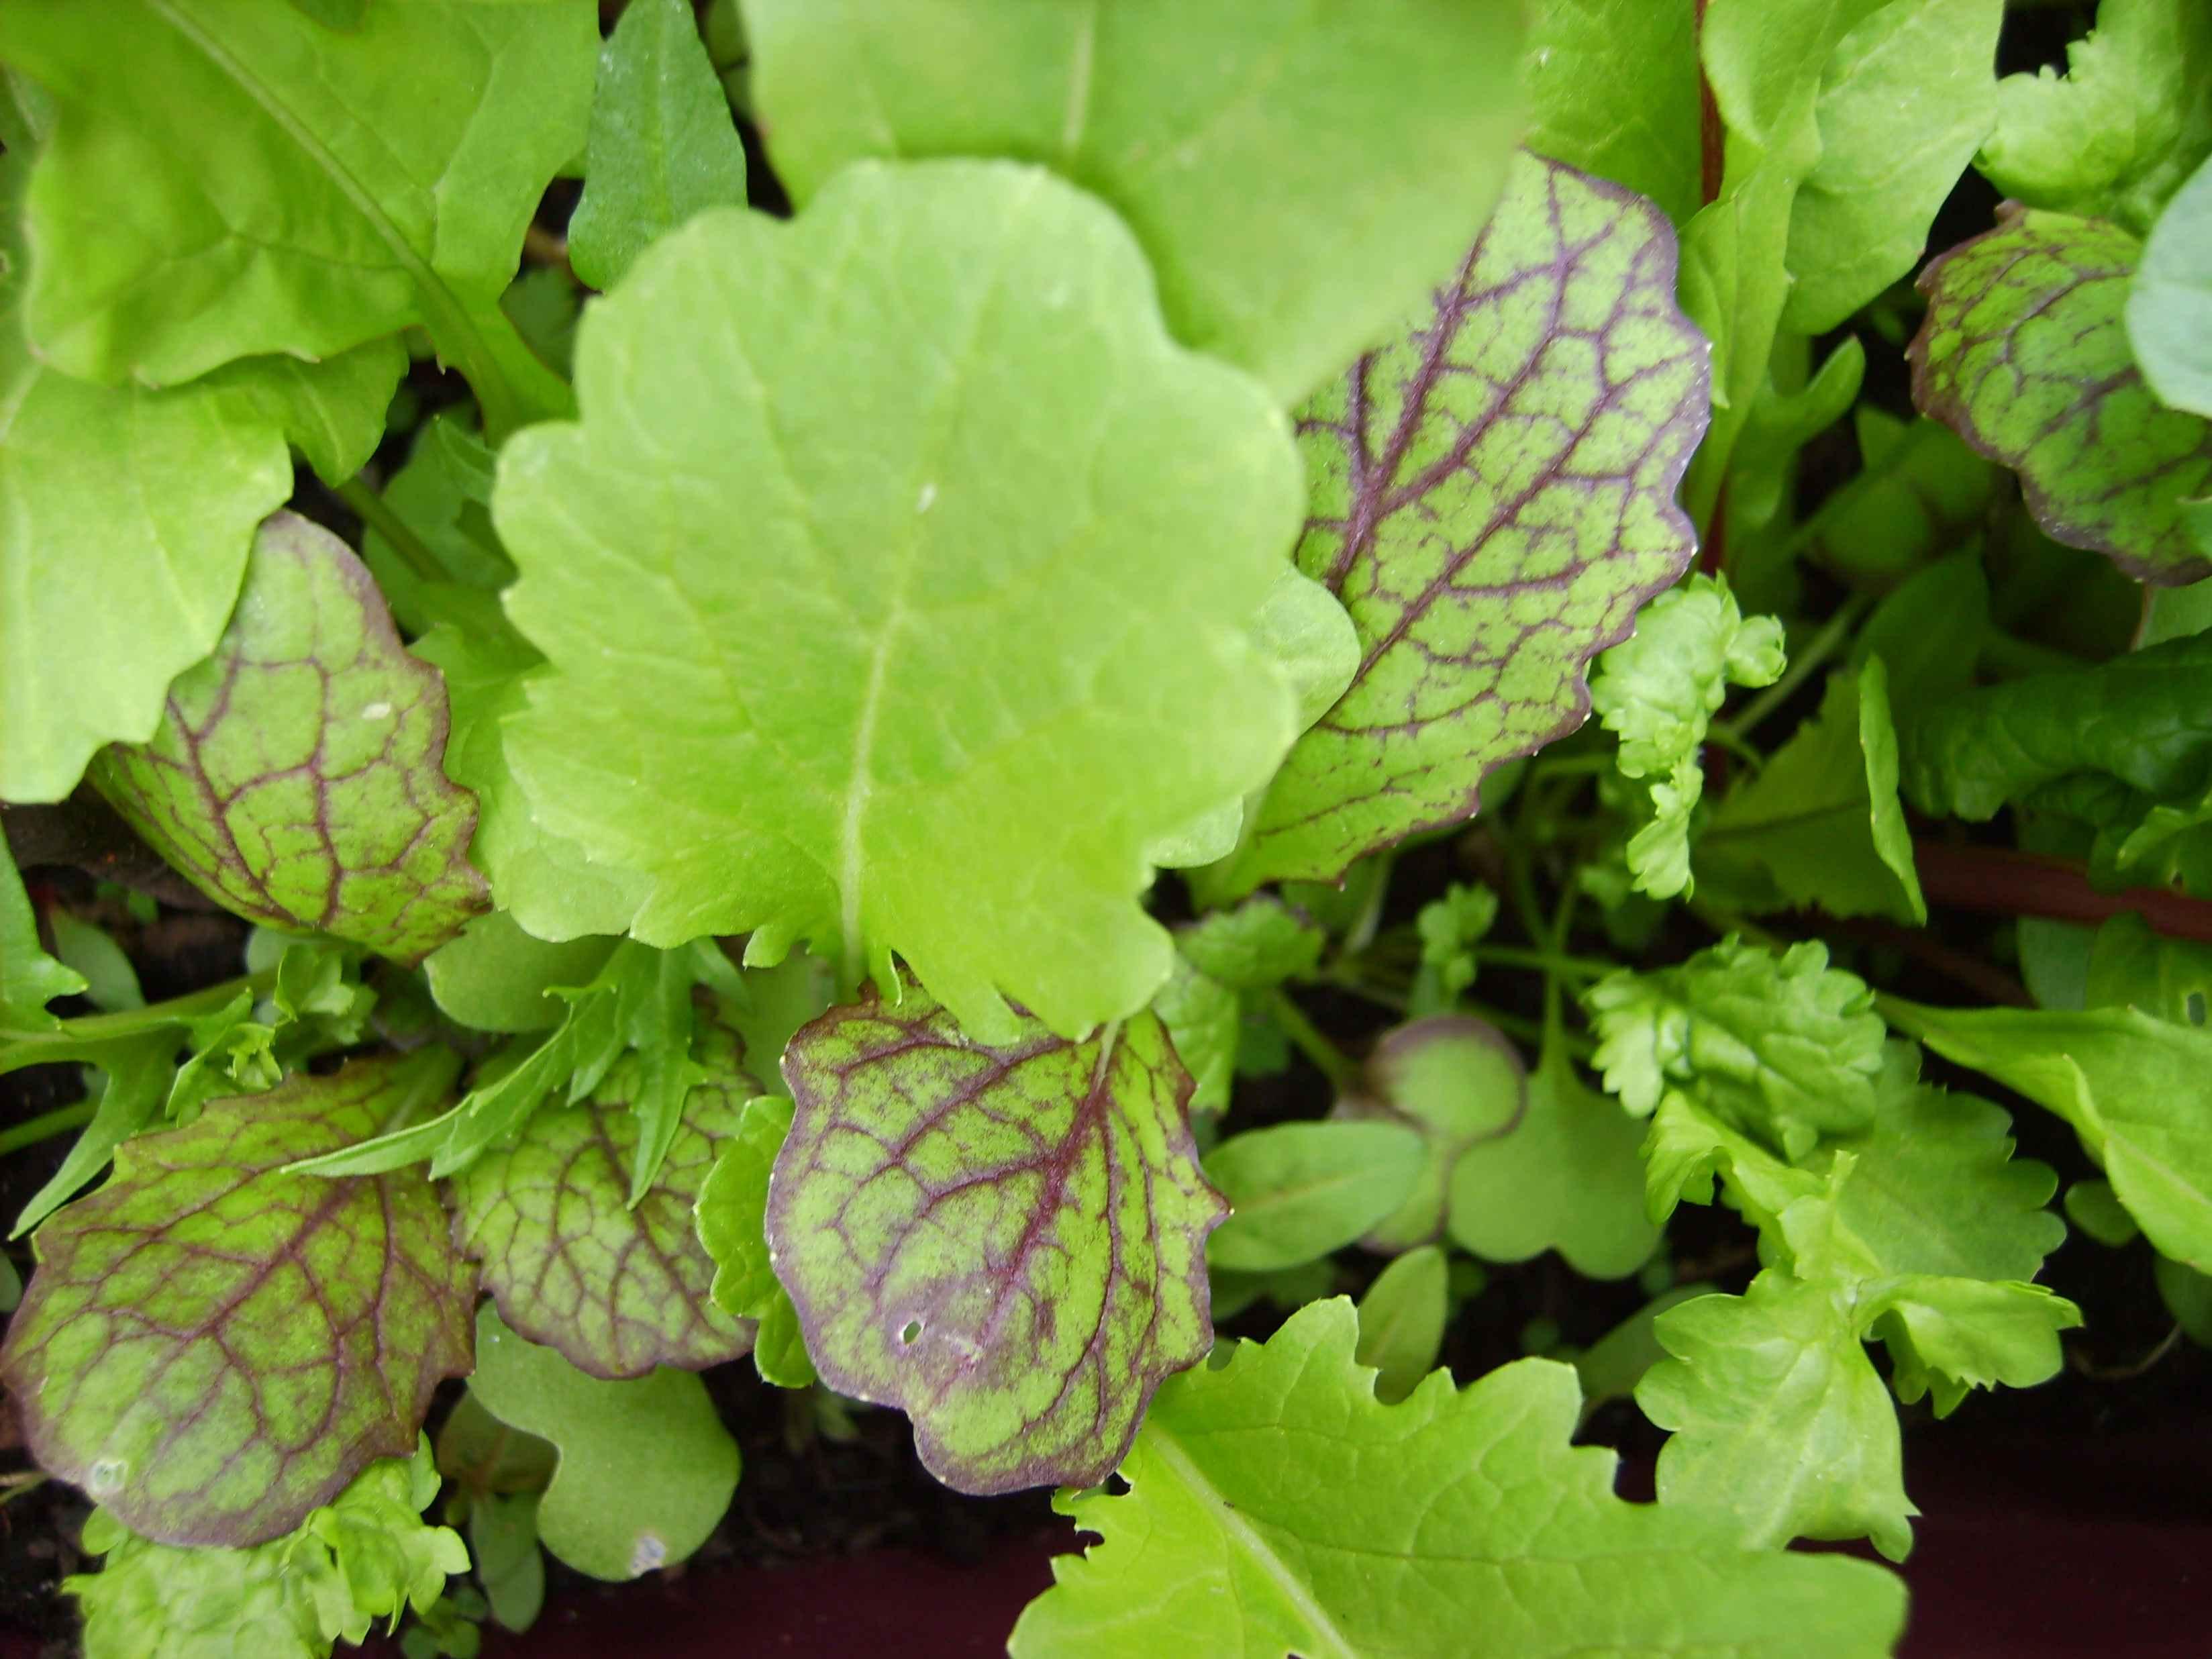 Salad up close